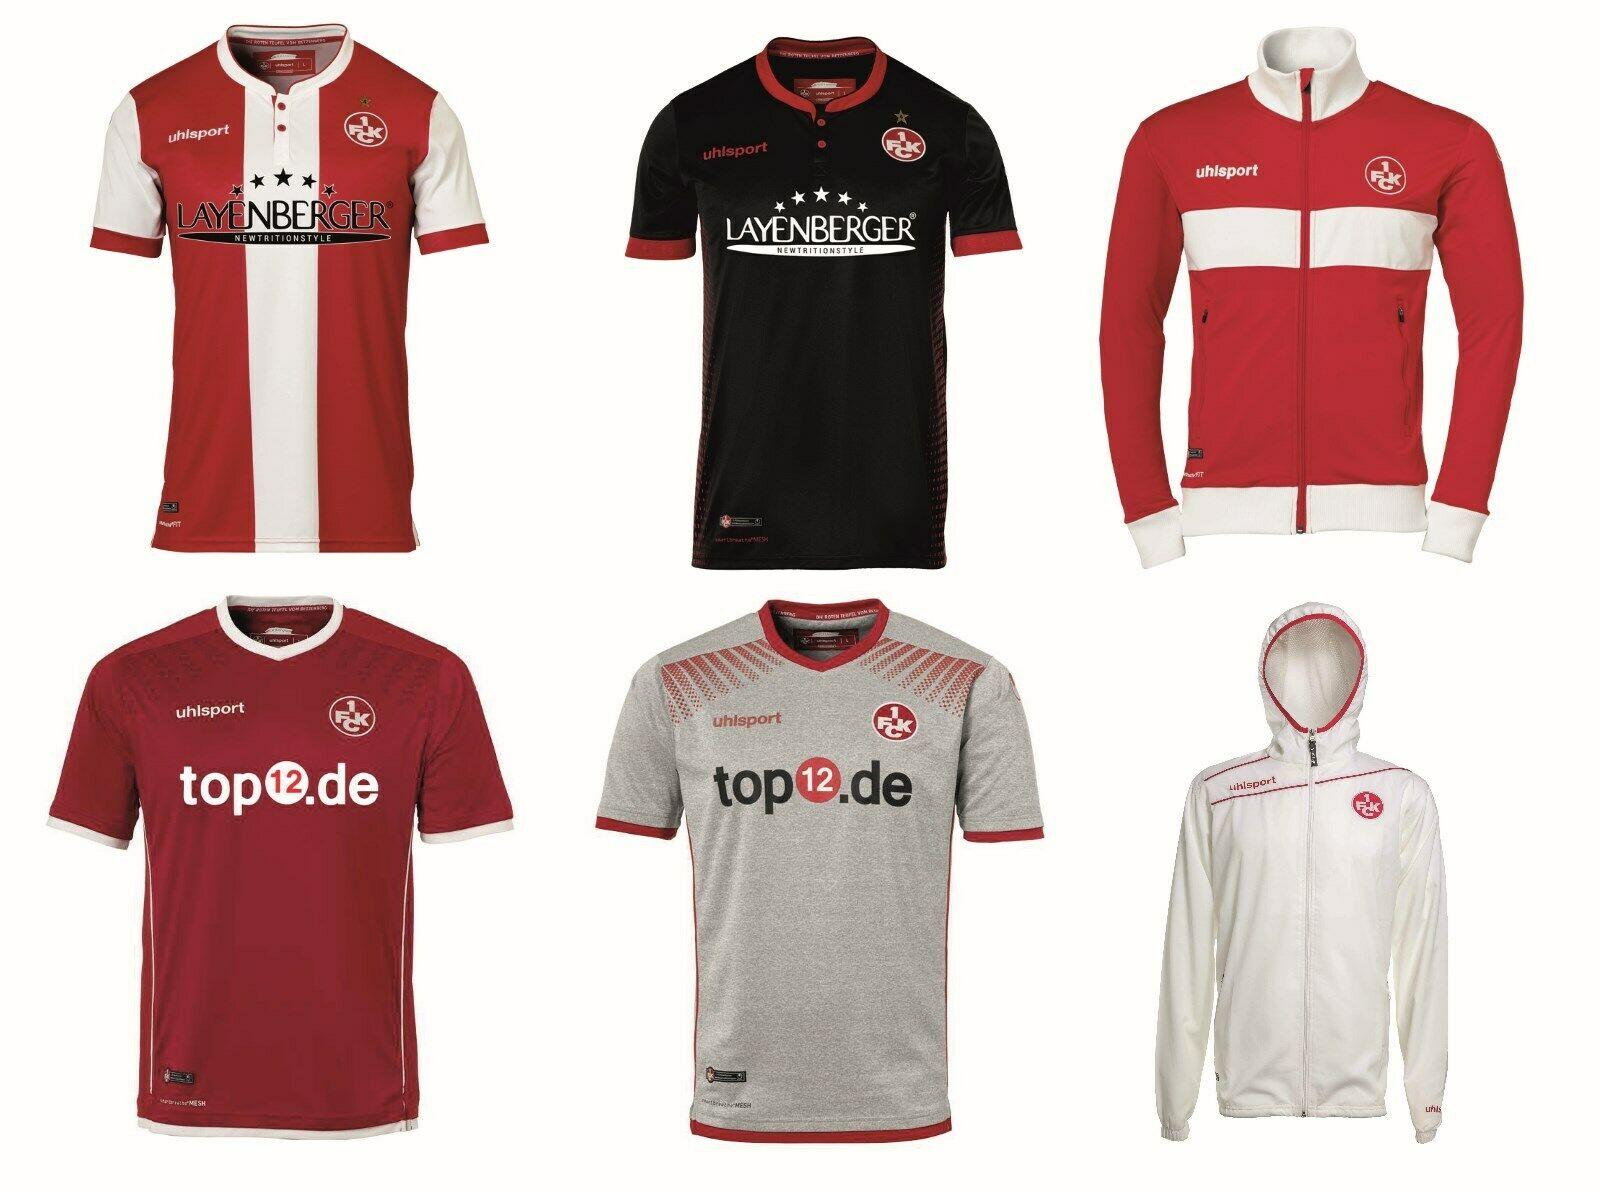 1.FC Kaiserslautern Uhlsport Restposten / Trikot / Hose / Jacke / T-Shirt / Hoody ab 3,95 Euro